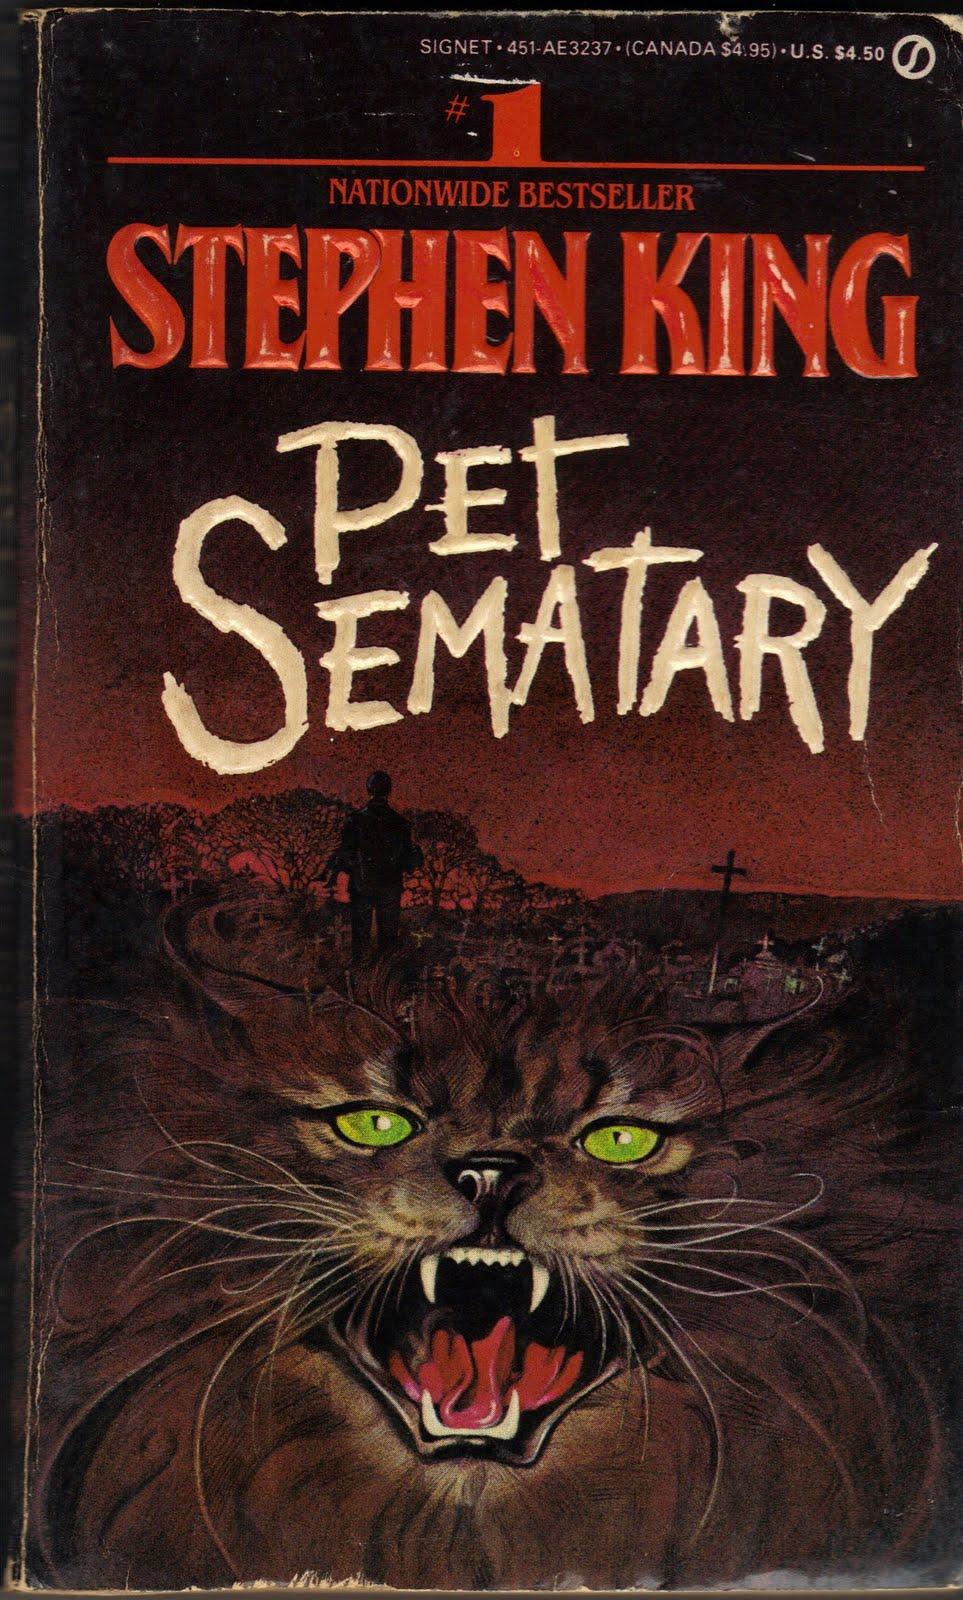 http://4.bp.blogspot.com/-dDG4uW_YtgE/TptCxkusPjI/AAAAAAAAETw/Ici6SC1BqW8/s1600/pet+sematary+1st+paperback+1984.jpg